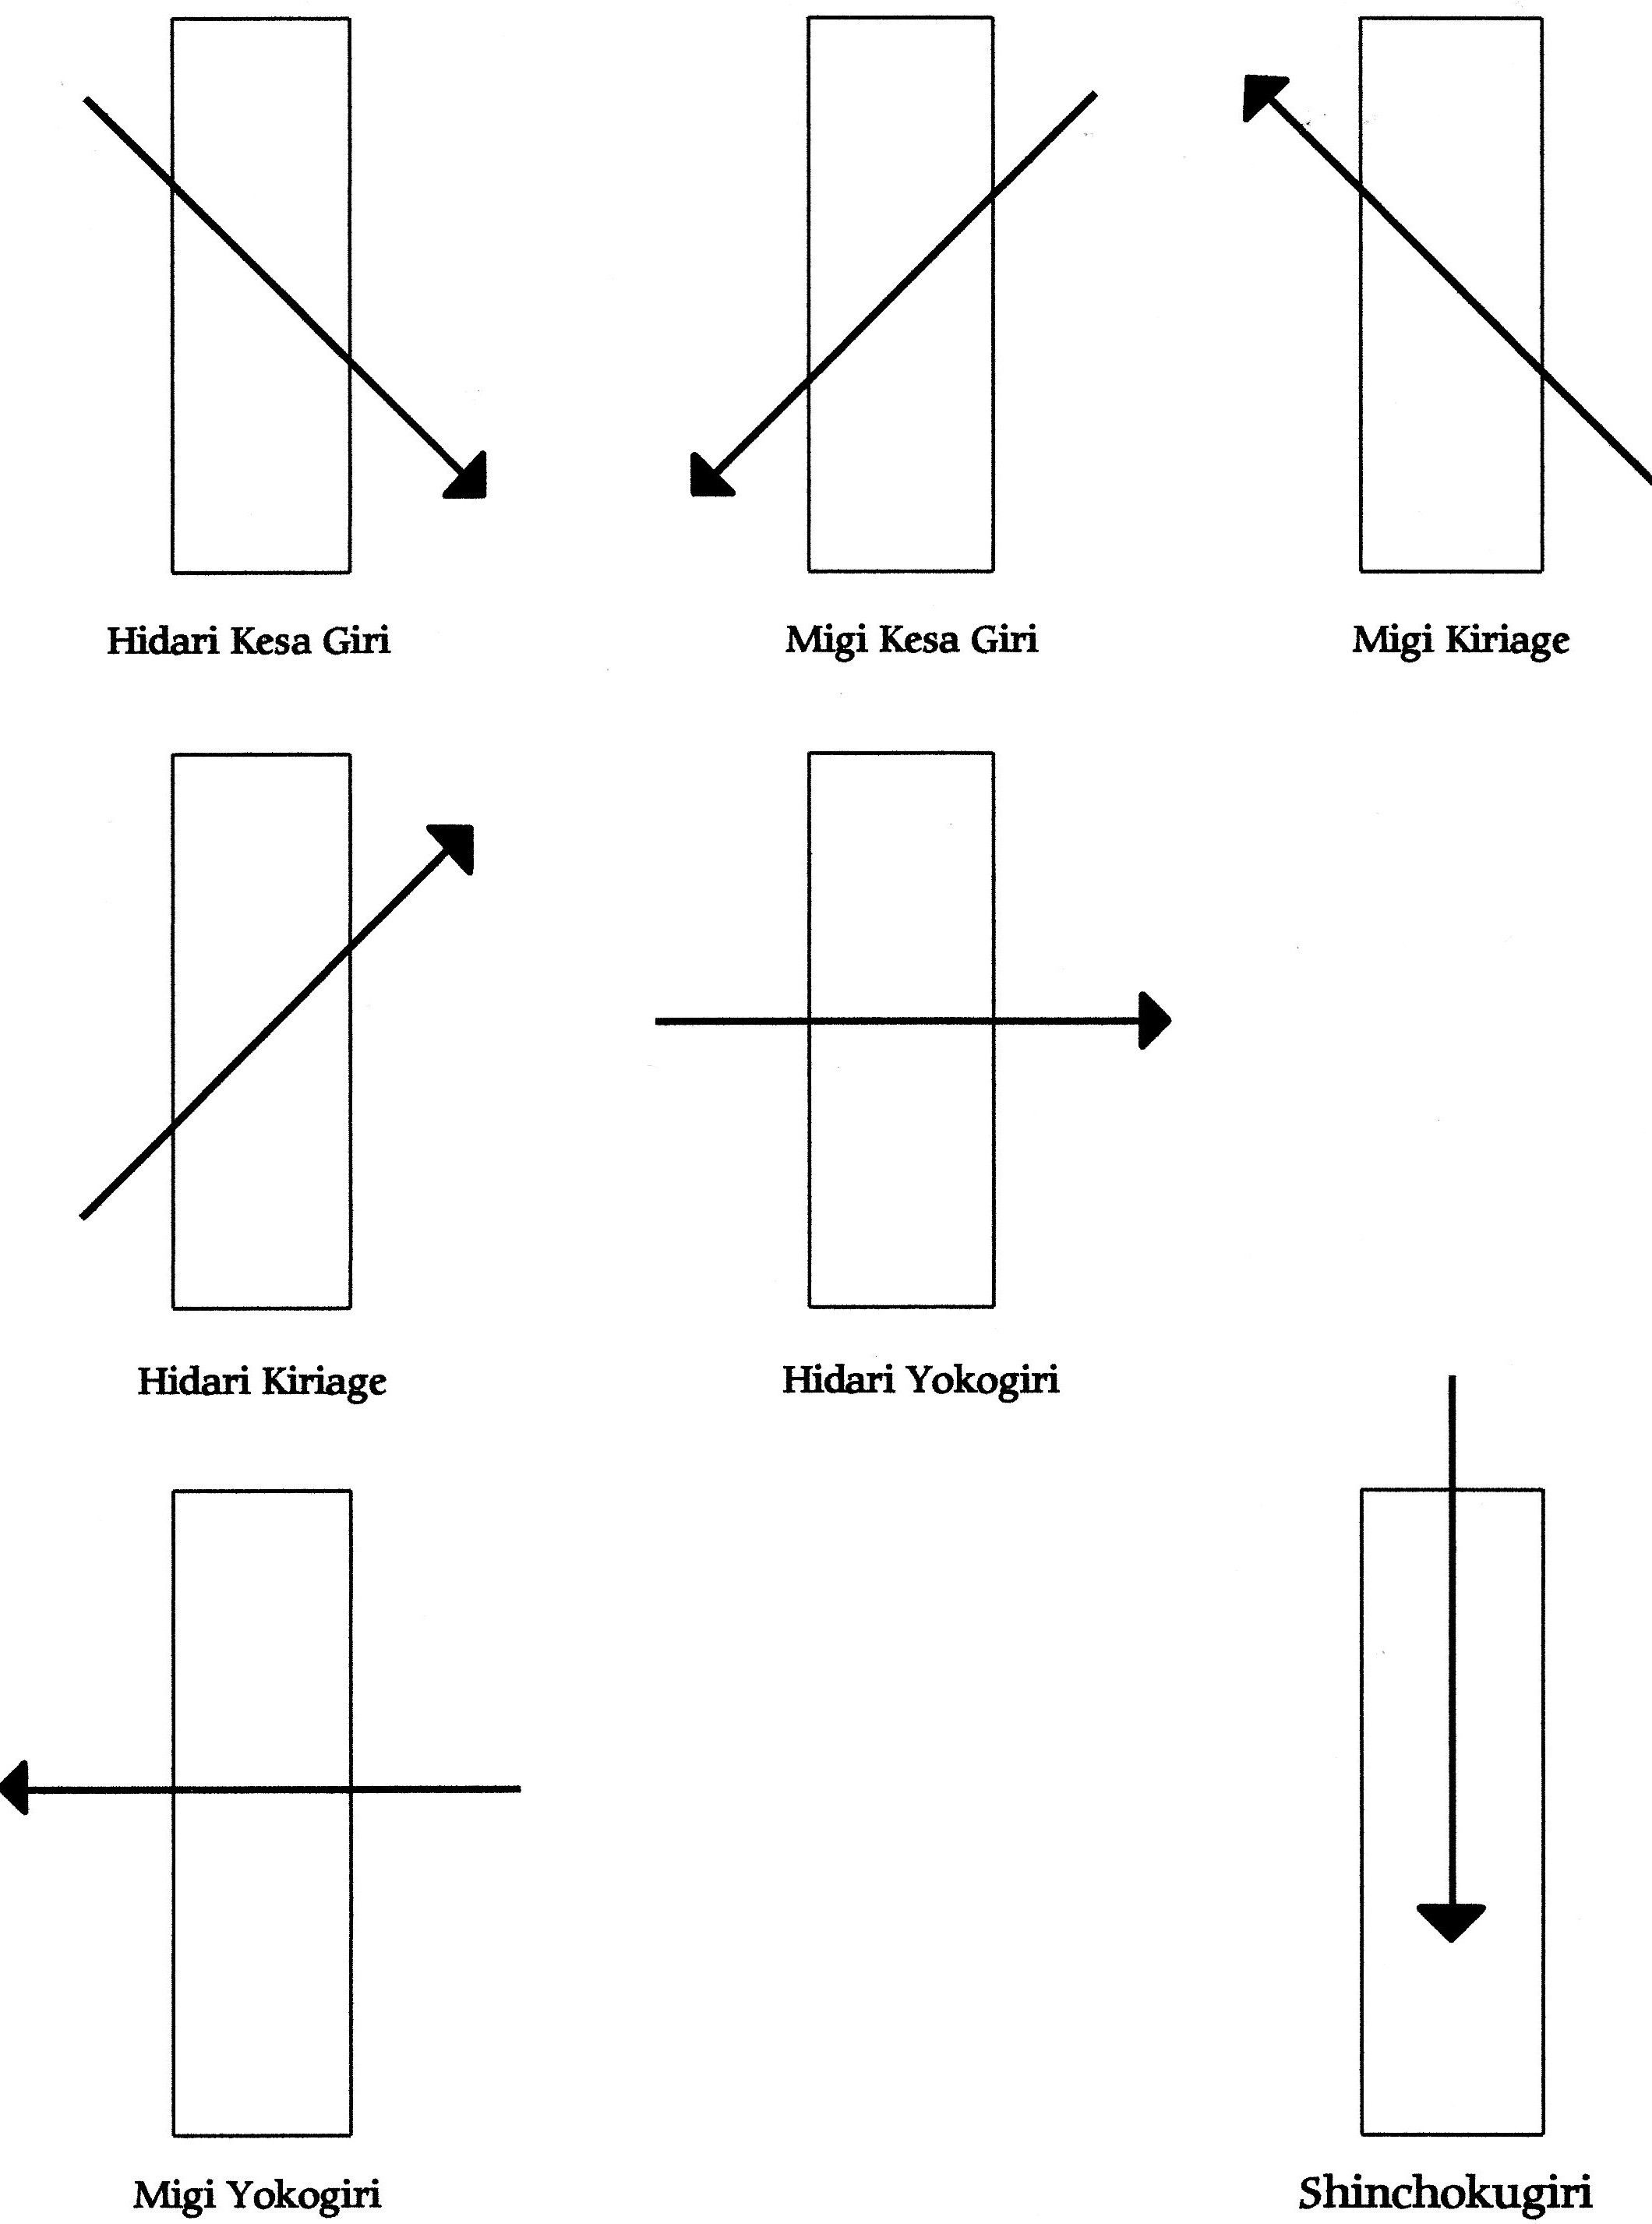 hight resolution of tameshigiri google search katana japanese culture line chart ninja sword